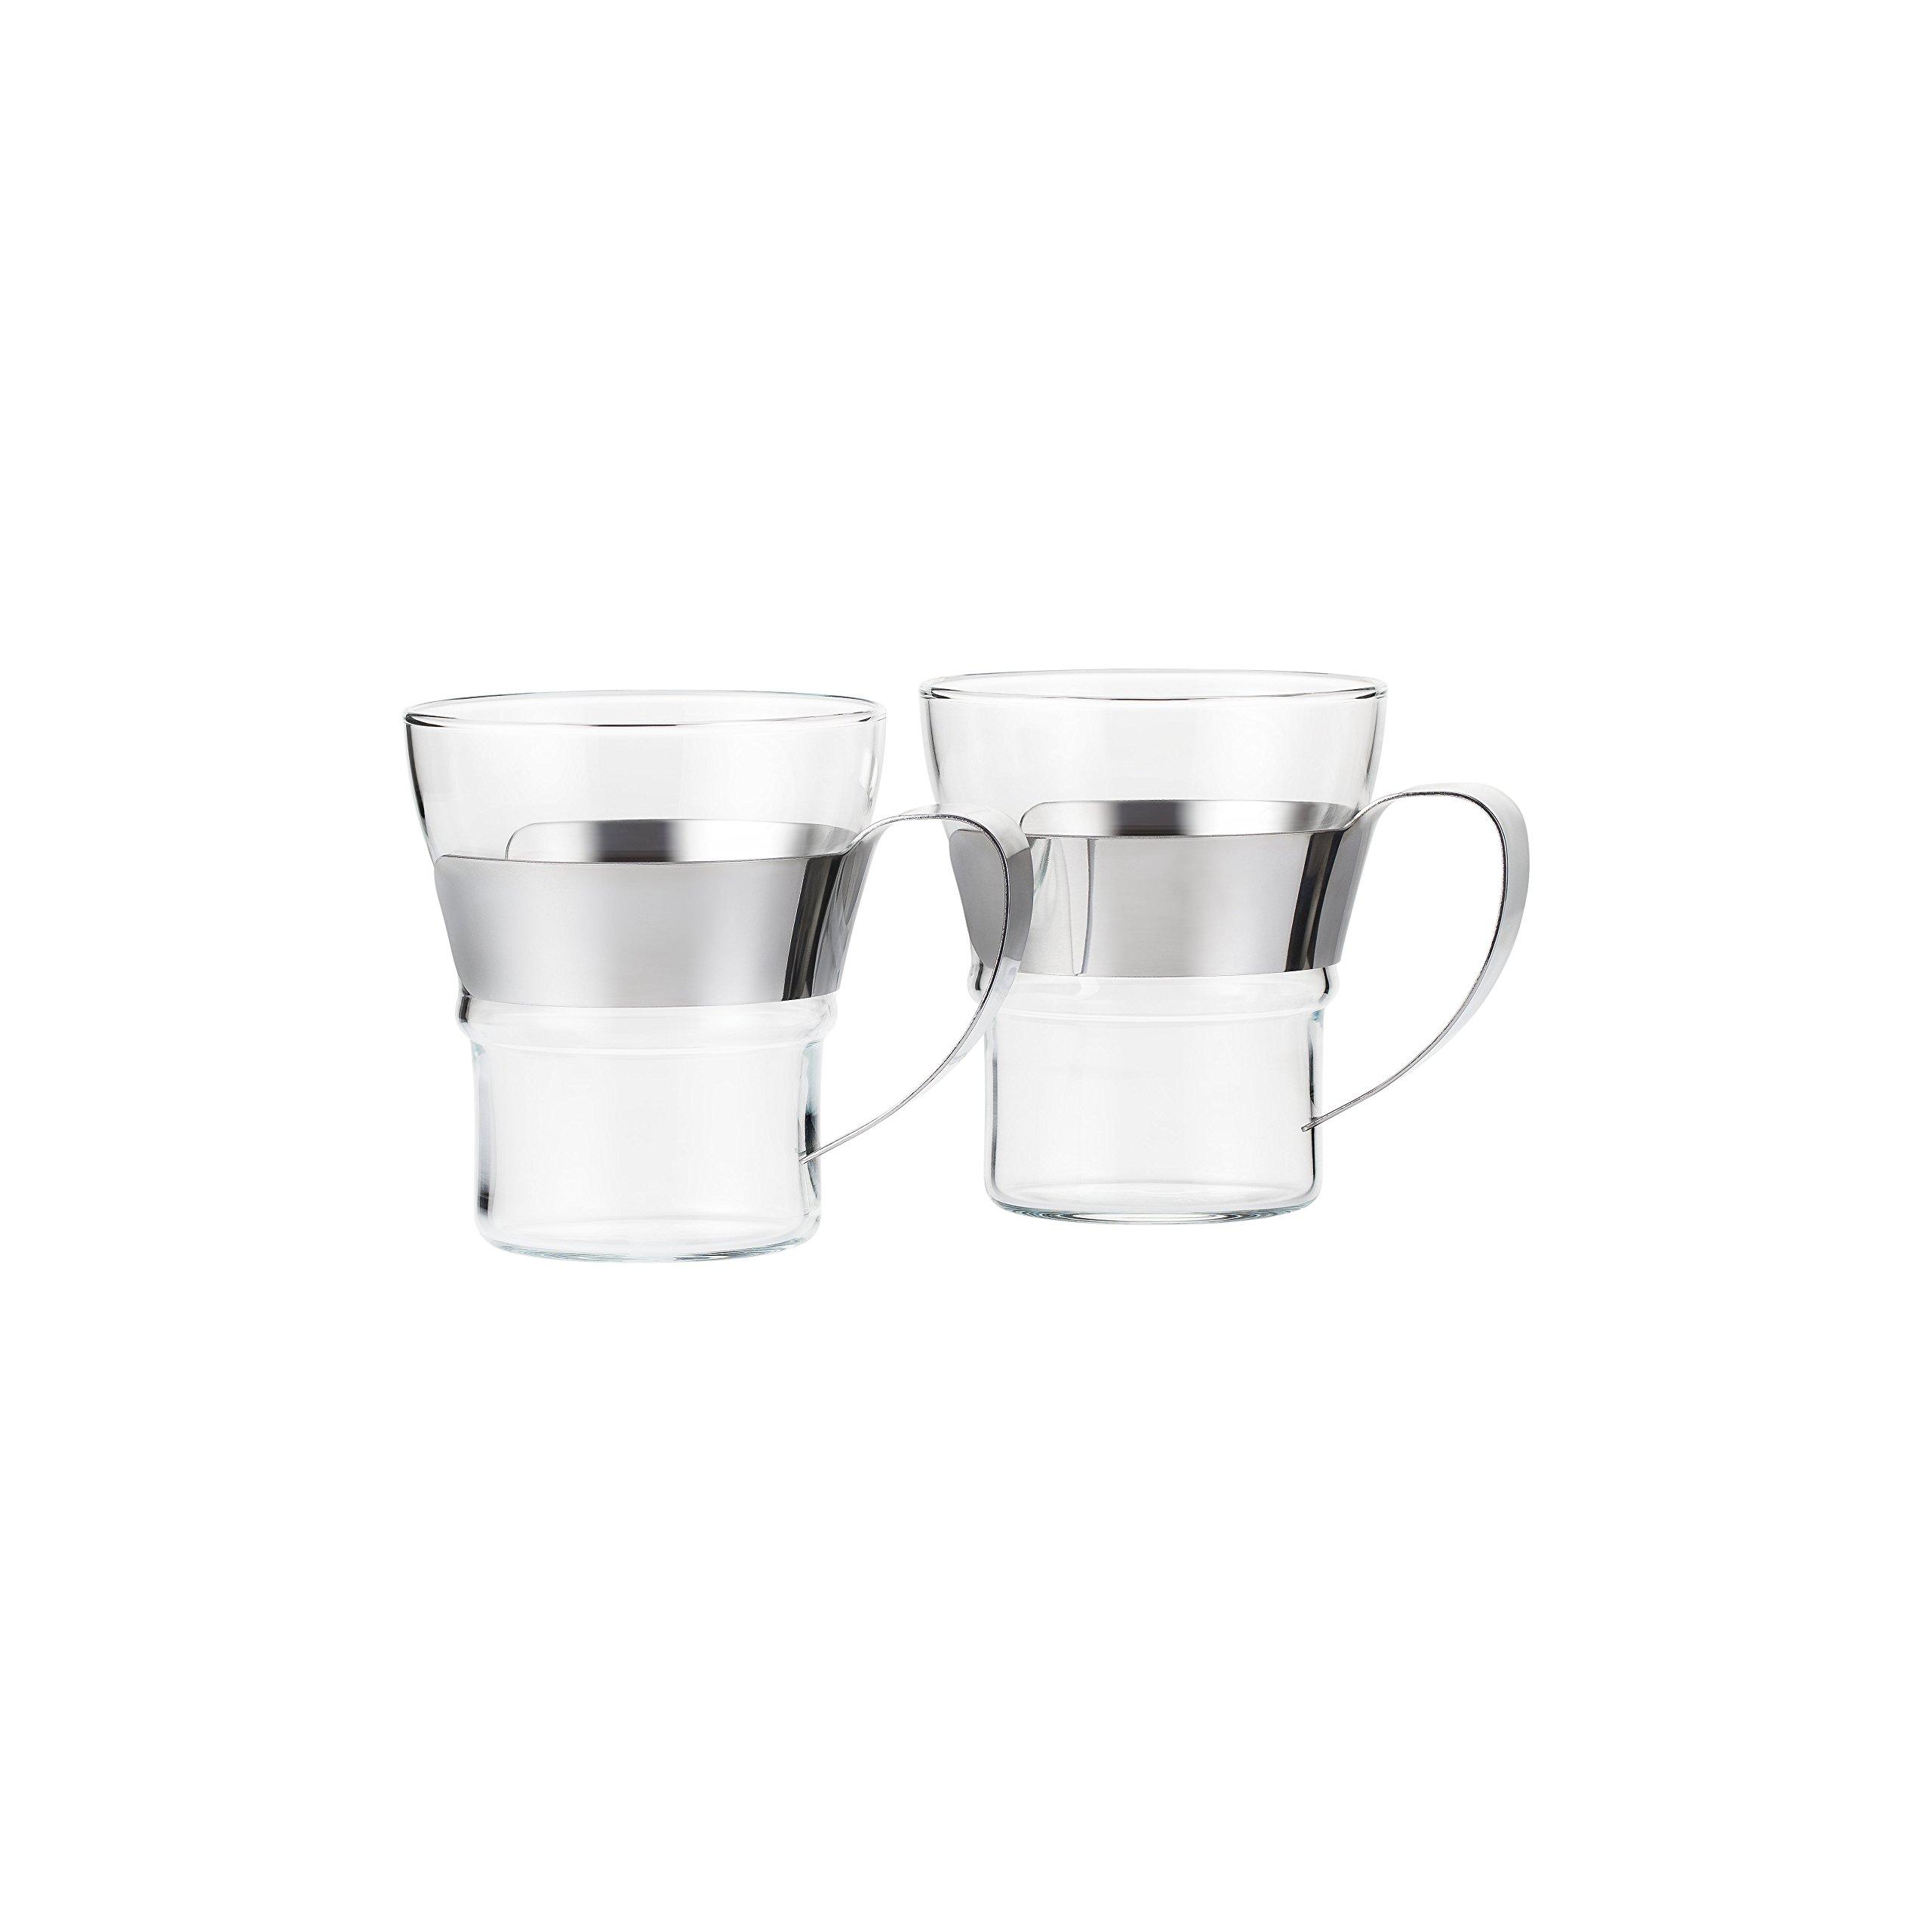 Bodum 4552-16 Assam 2 Piece Small Tea Glass with Steel Handle, 10 oz, Chrome